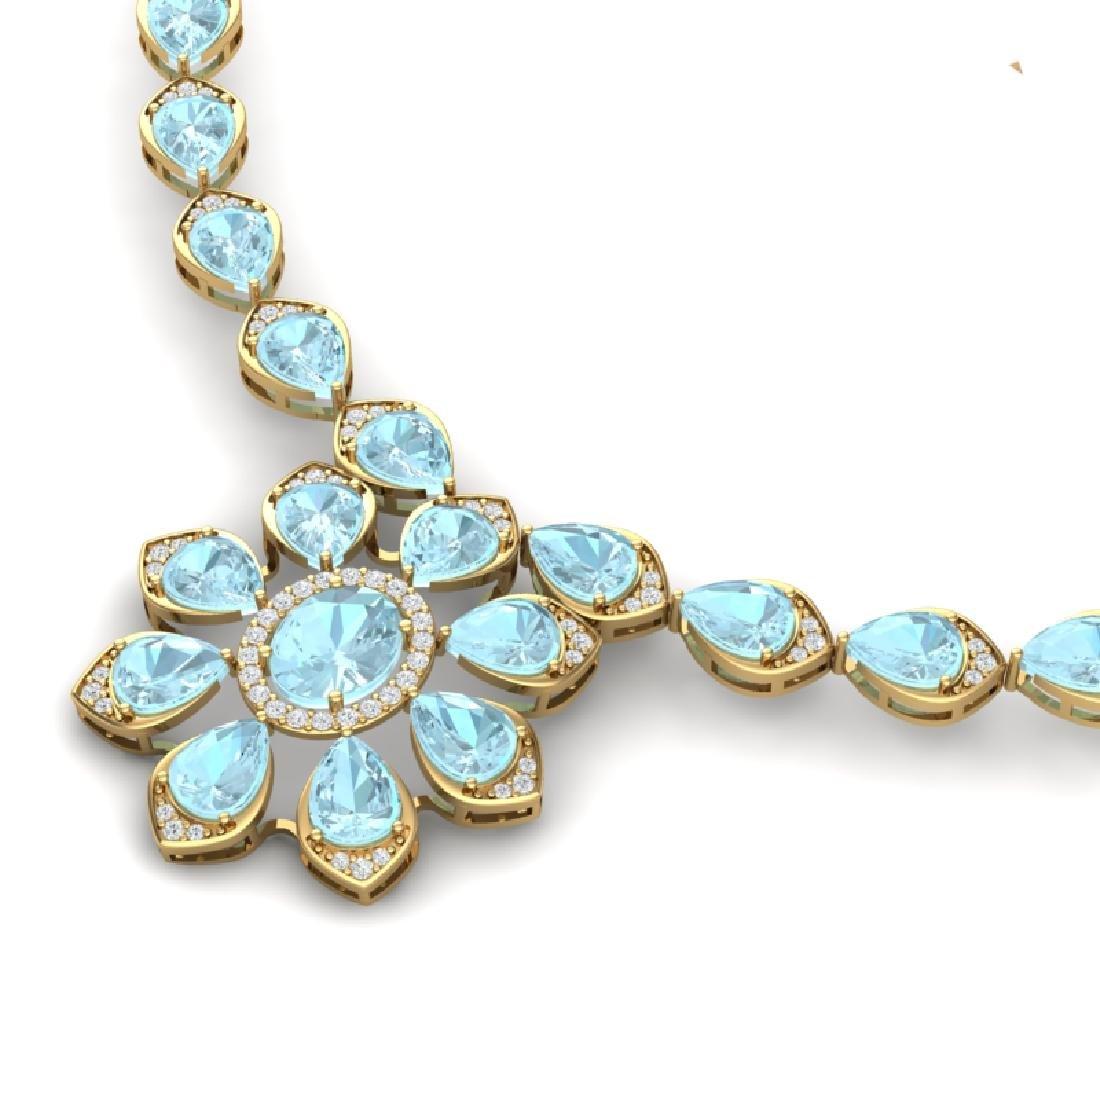 29.34 CTW Royalty Sky Topaz & VS Diamond Necklace 18K - 2